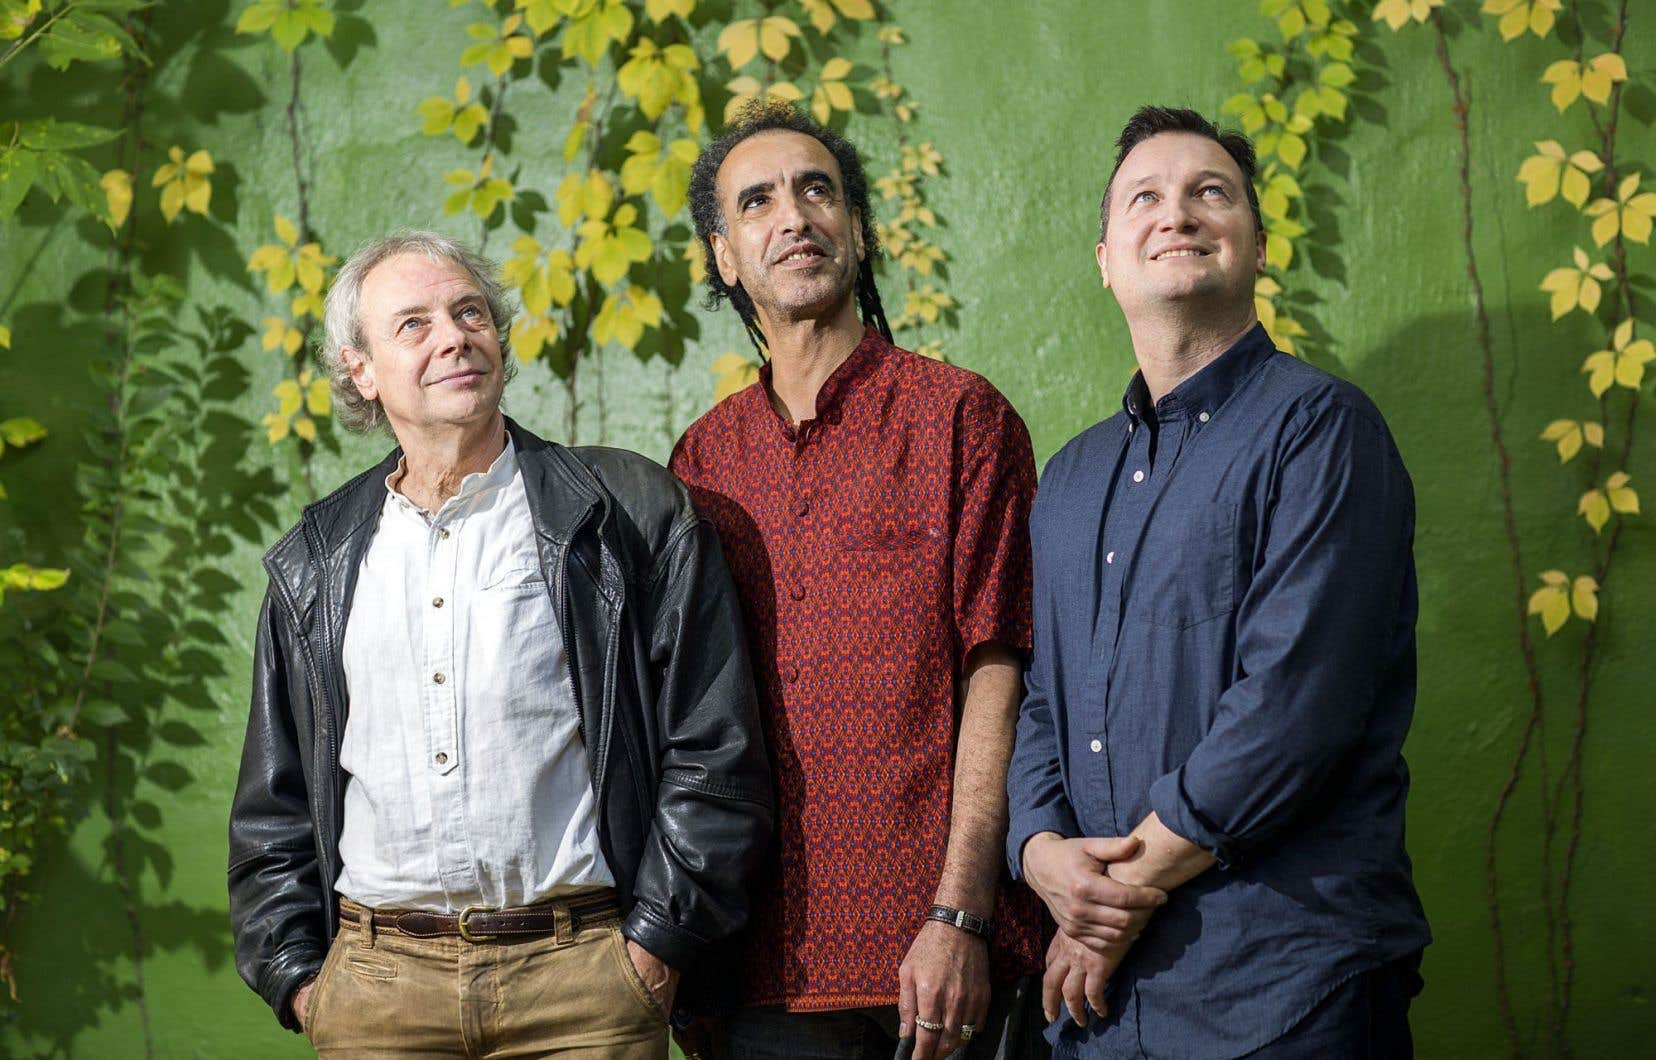 Guy Pelletier, Saïd Mesnaoui et Bertil Schulrabe